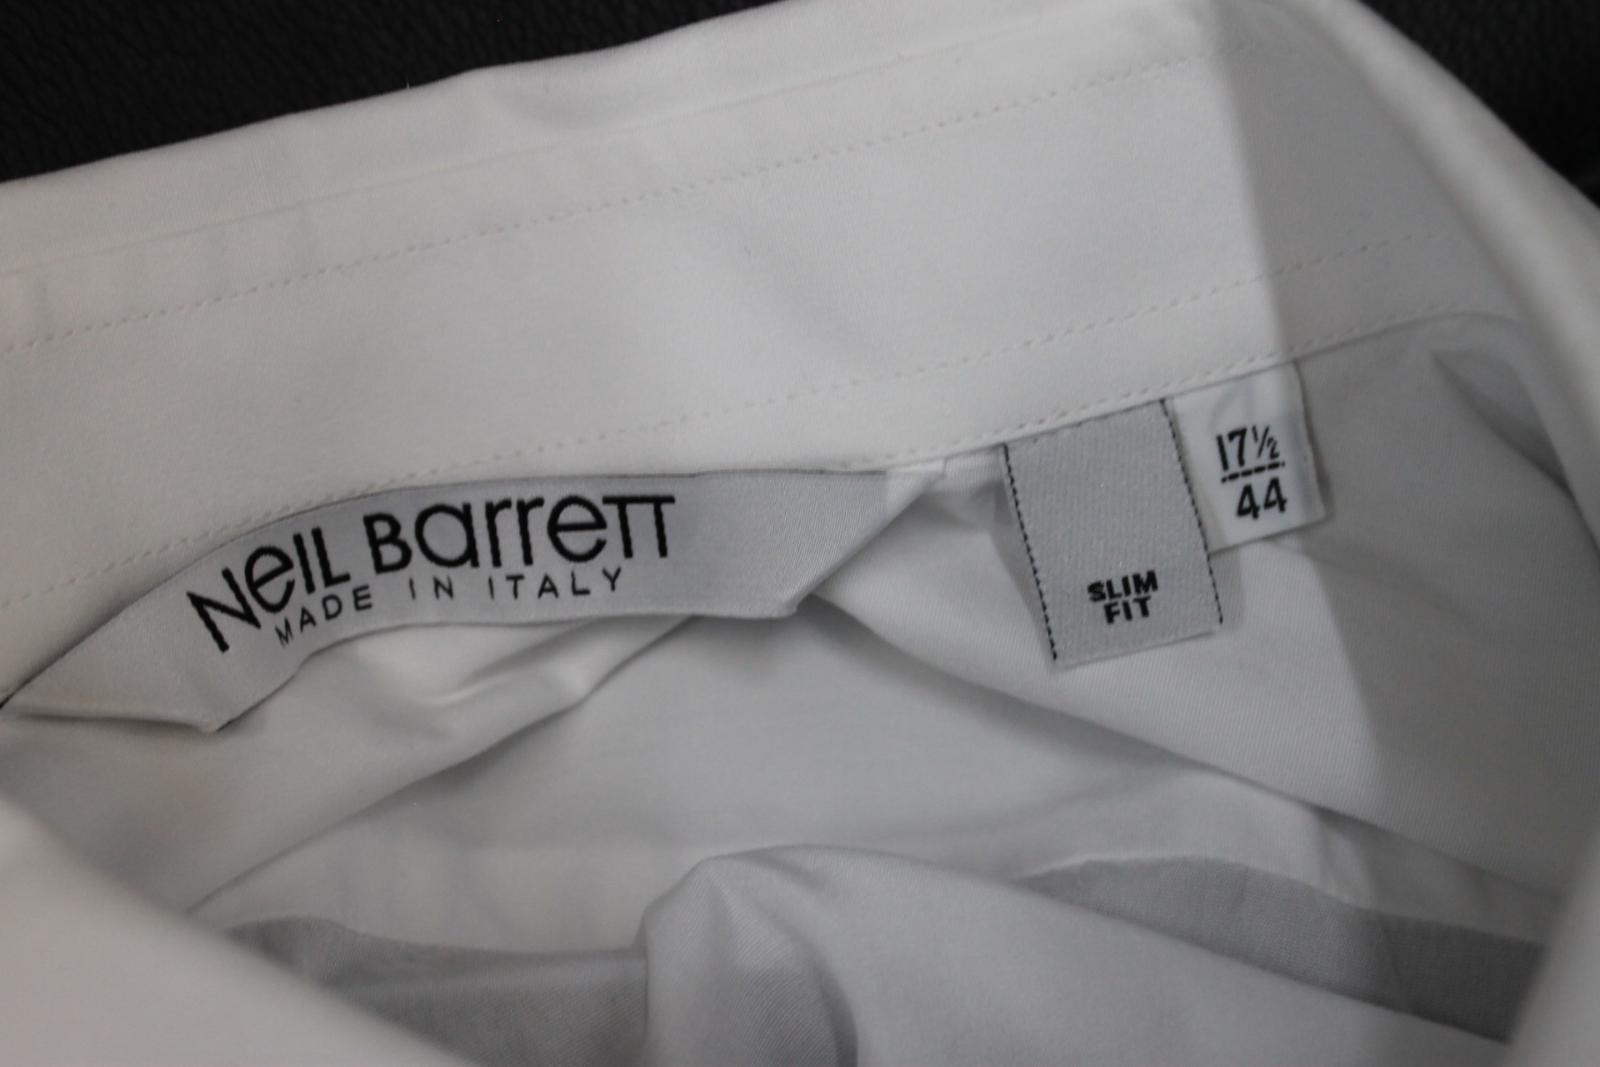 Neil-barrett-hombre-blanco-de-algodon-manga-de-Rayo-con-cuello-camisa-tamano-17-5-034 miniatura 10